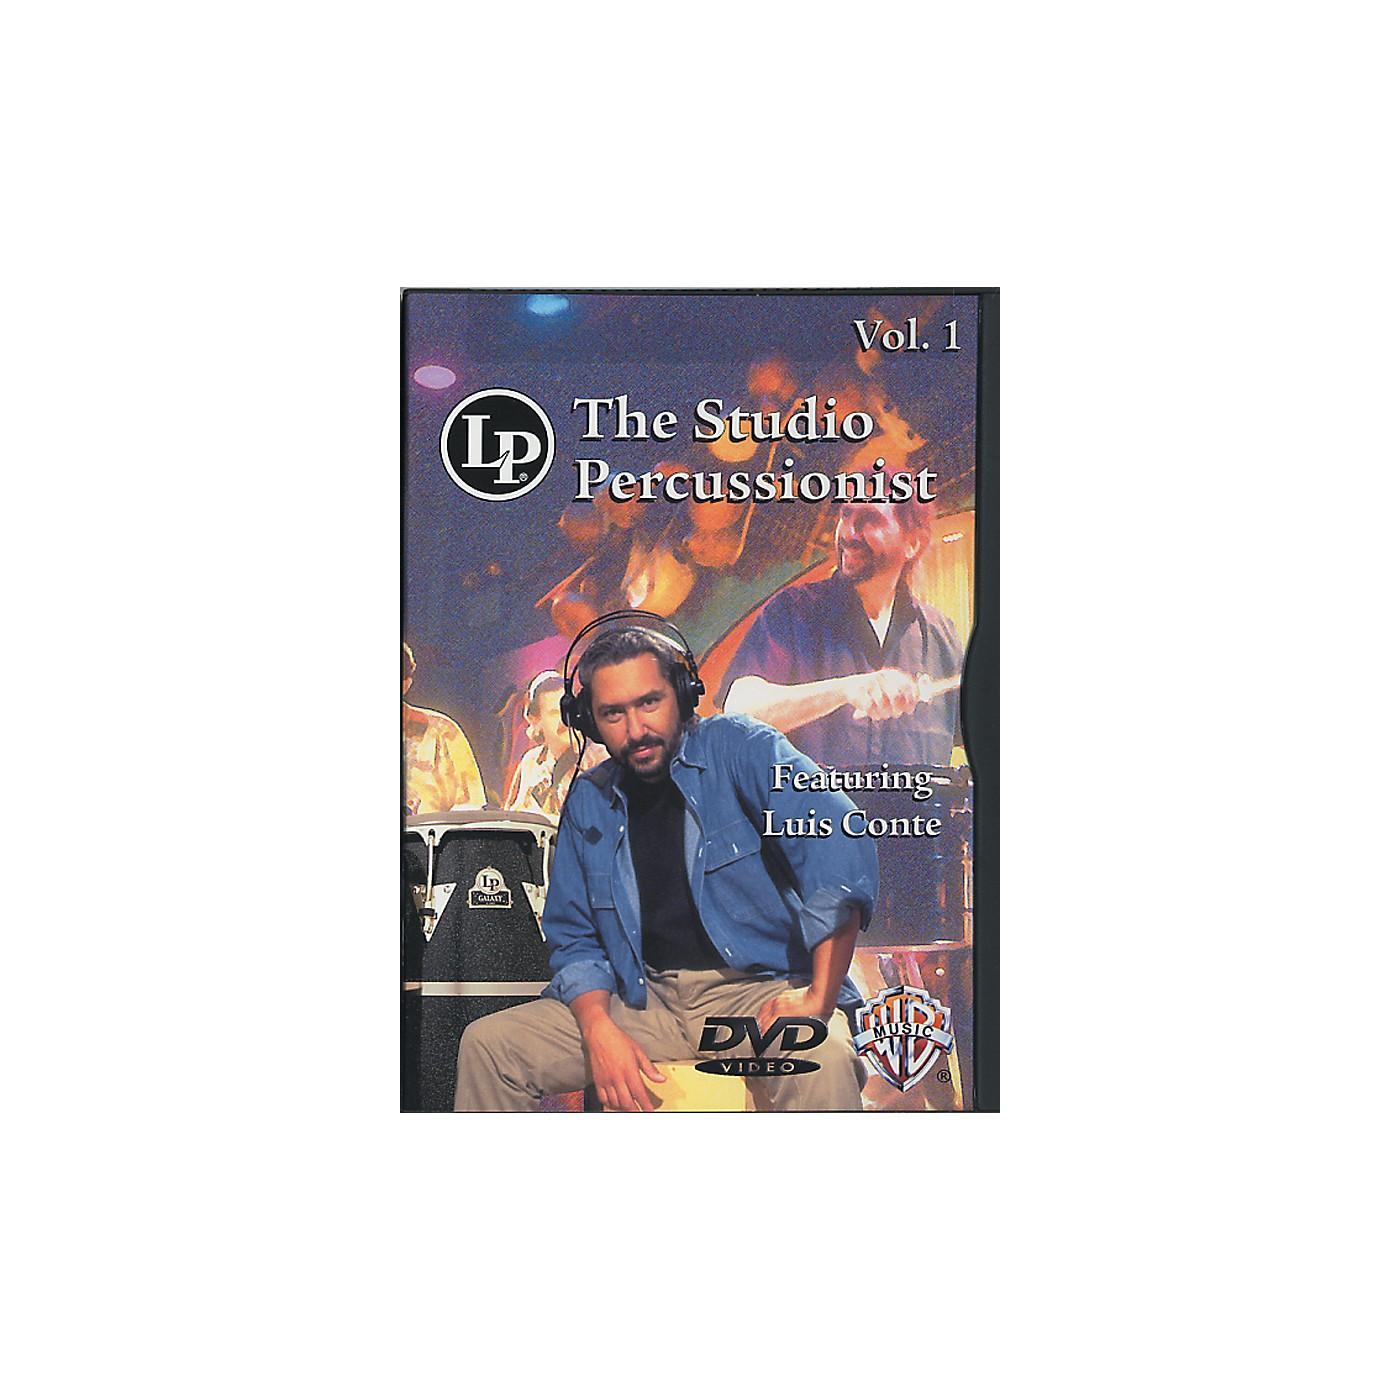 LP The Studio Percussionist Vol. 1 featuring Luis Conte DVD thumbnail